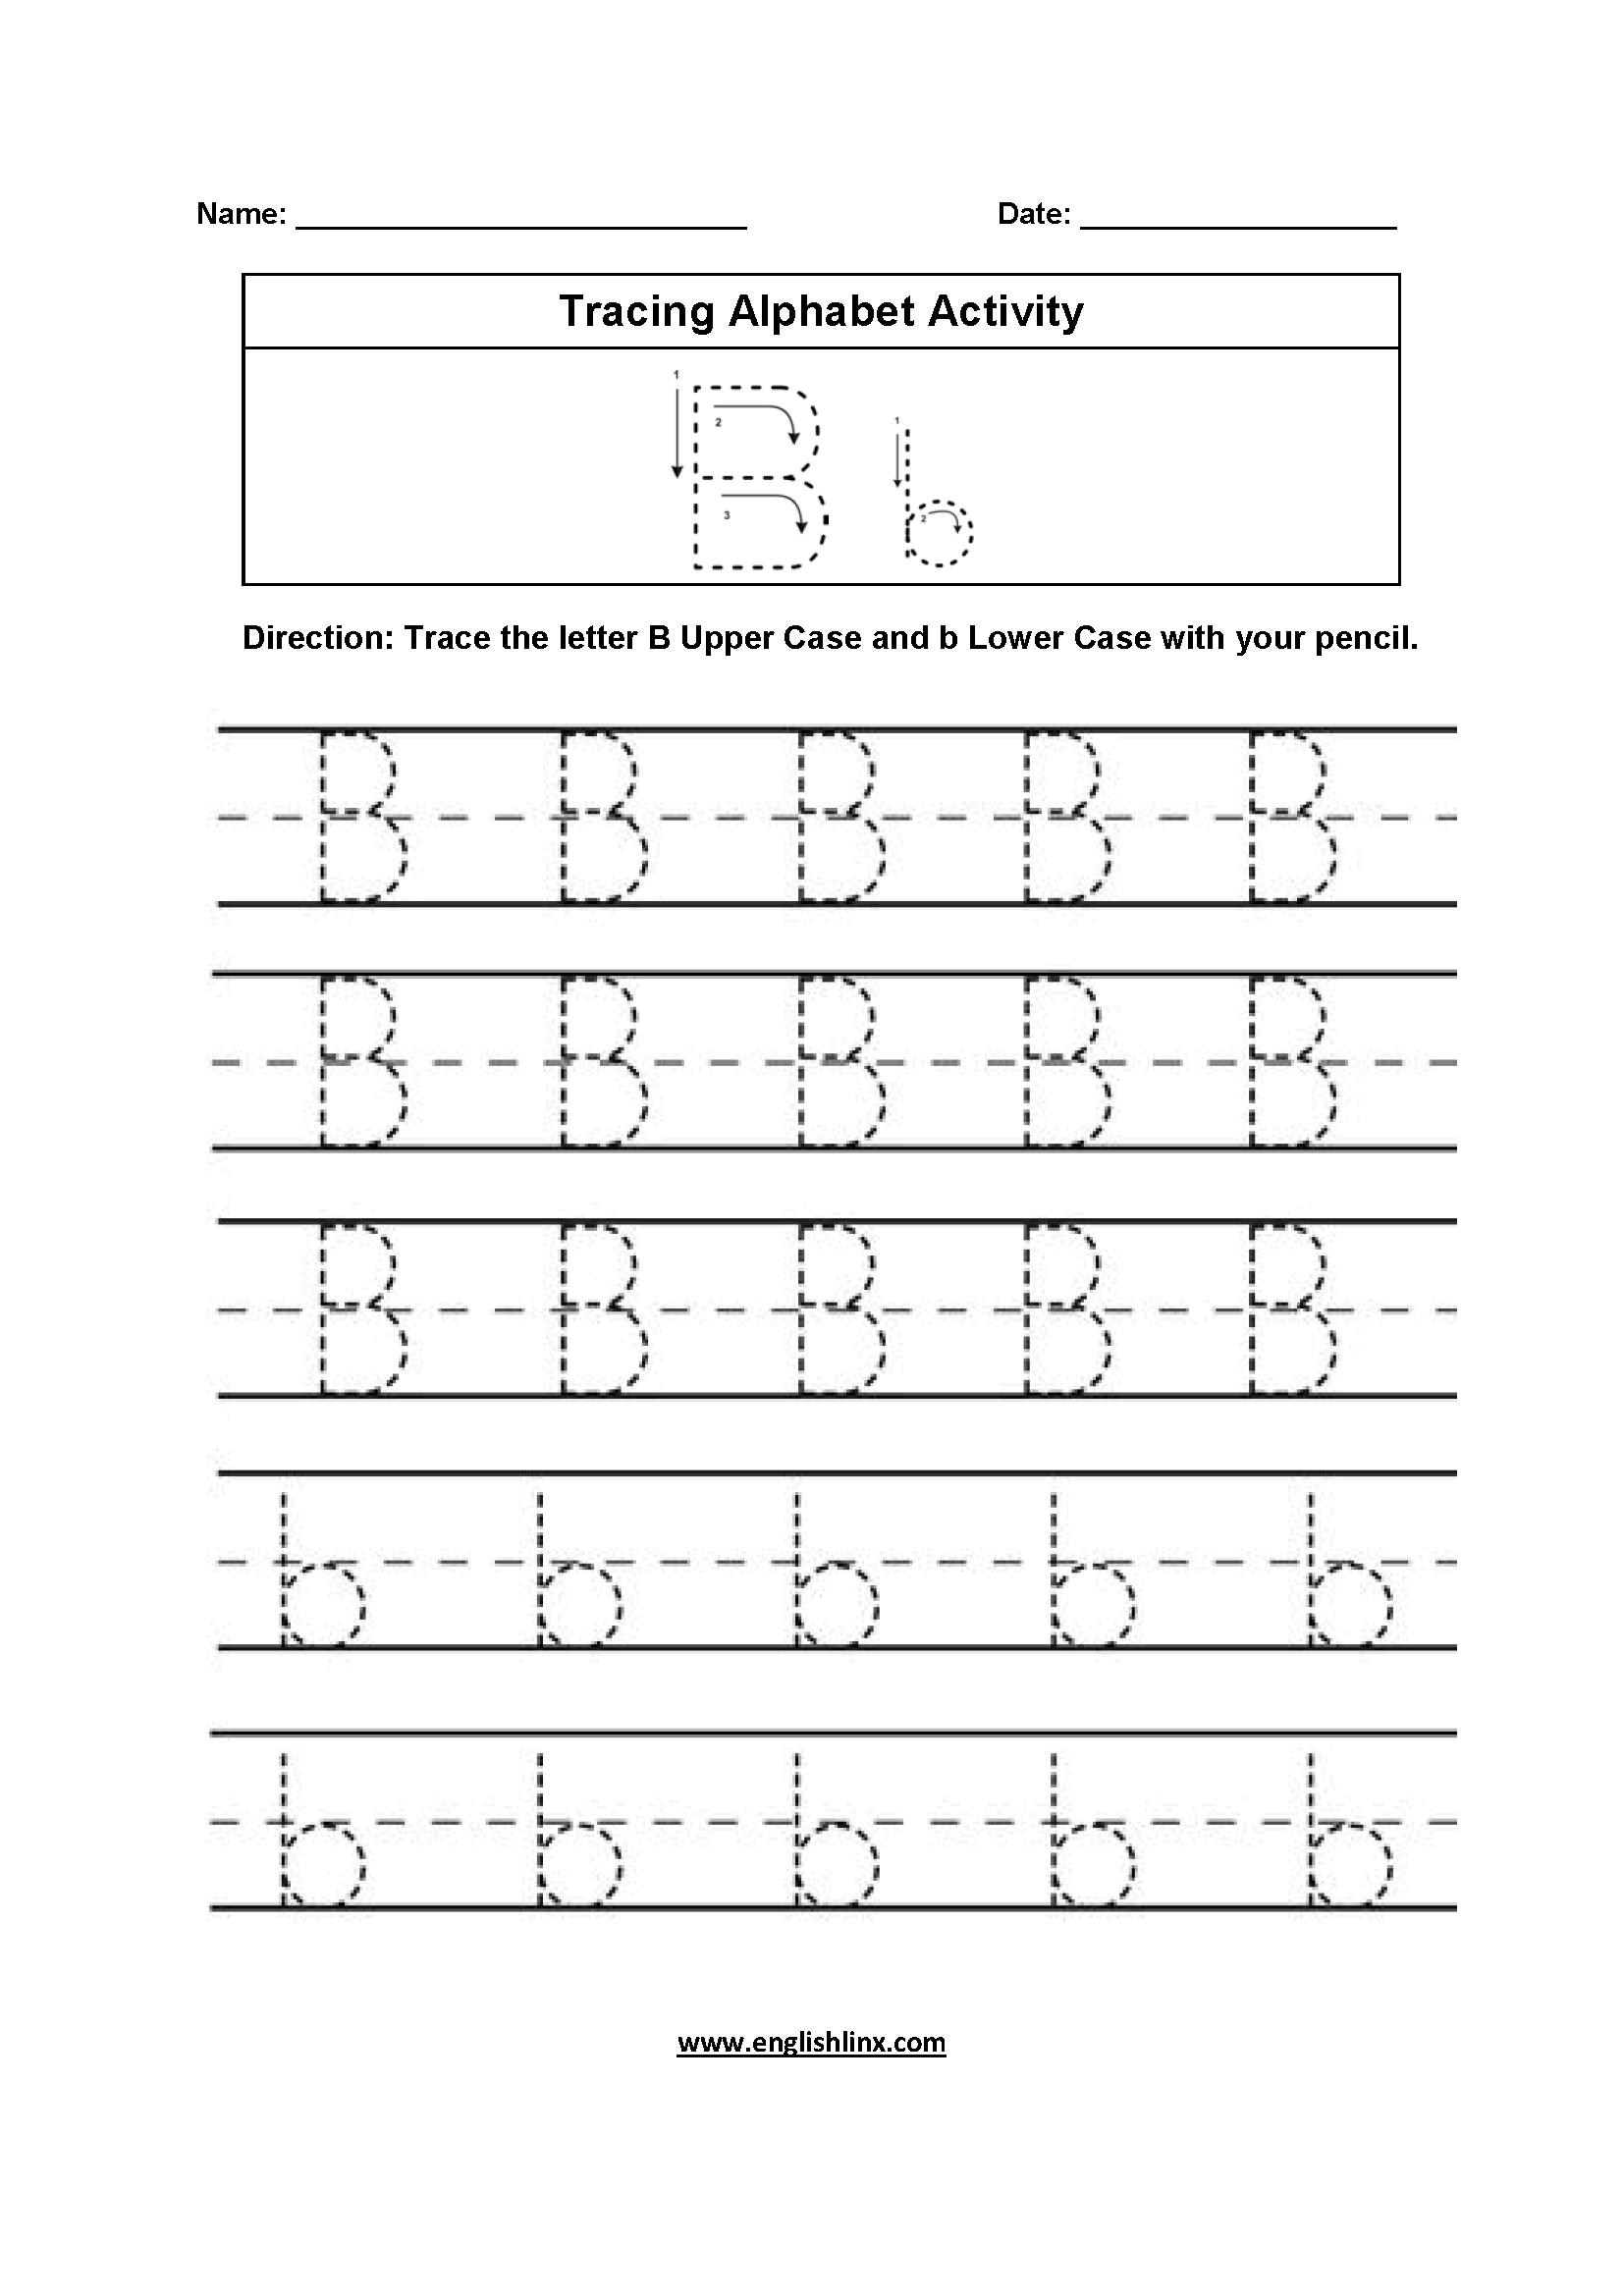 Alphabet Worksheets | Tracing Alphabet Worksheets for Grade R Alphabet Worksheets Pdf